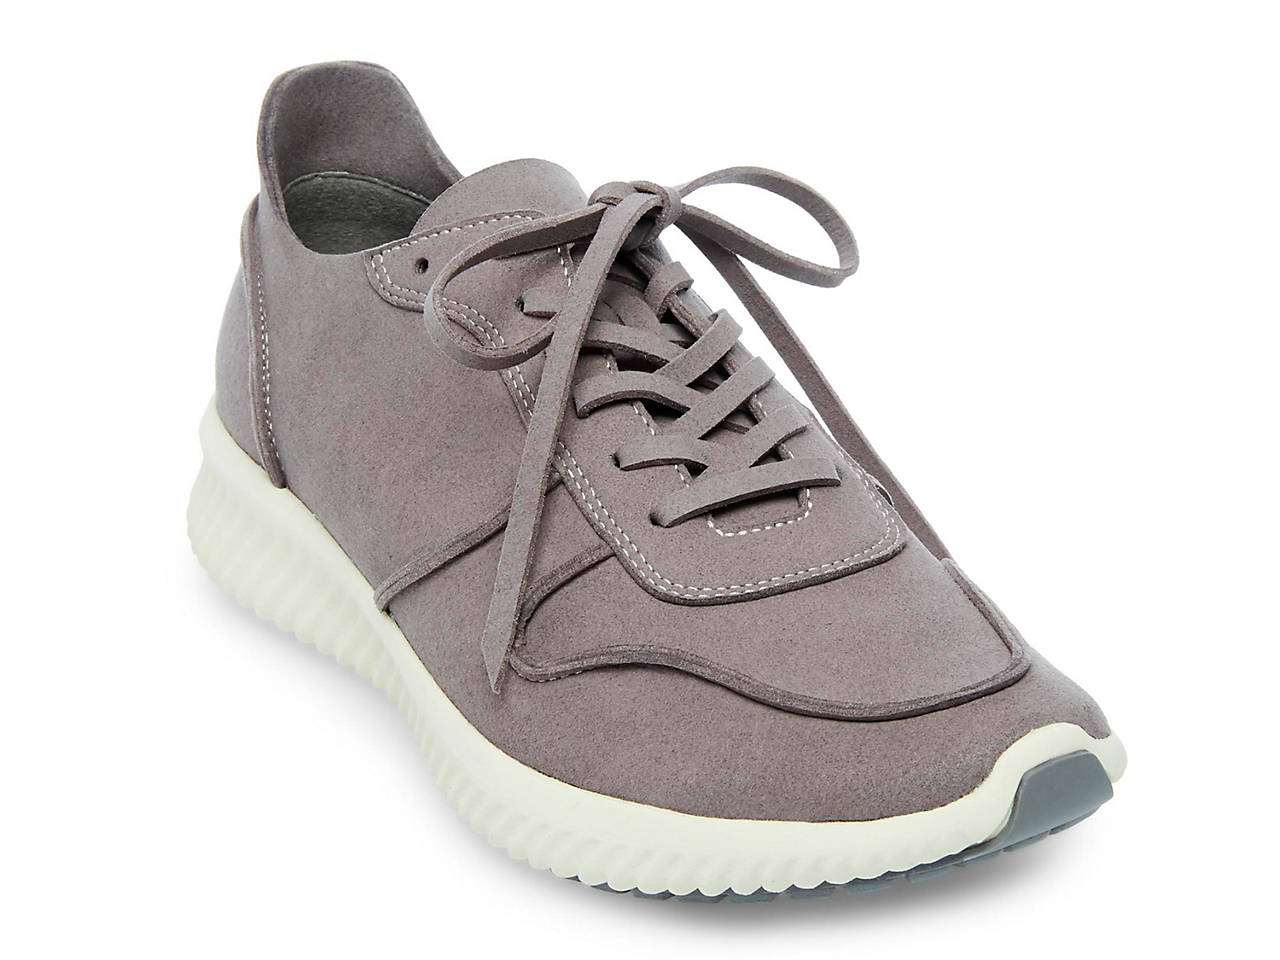 621c62dced7 Rolf Sneaker